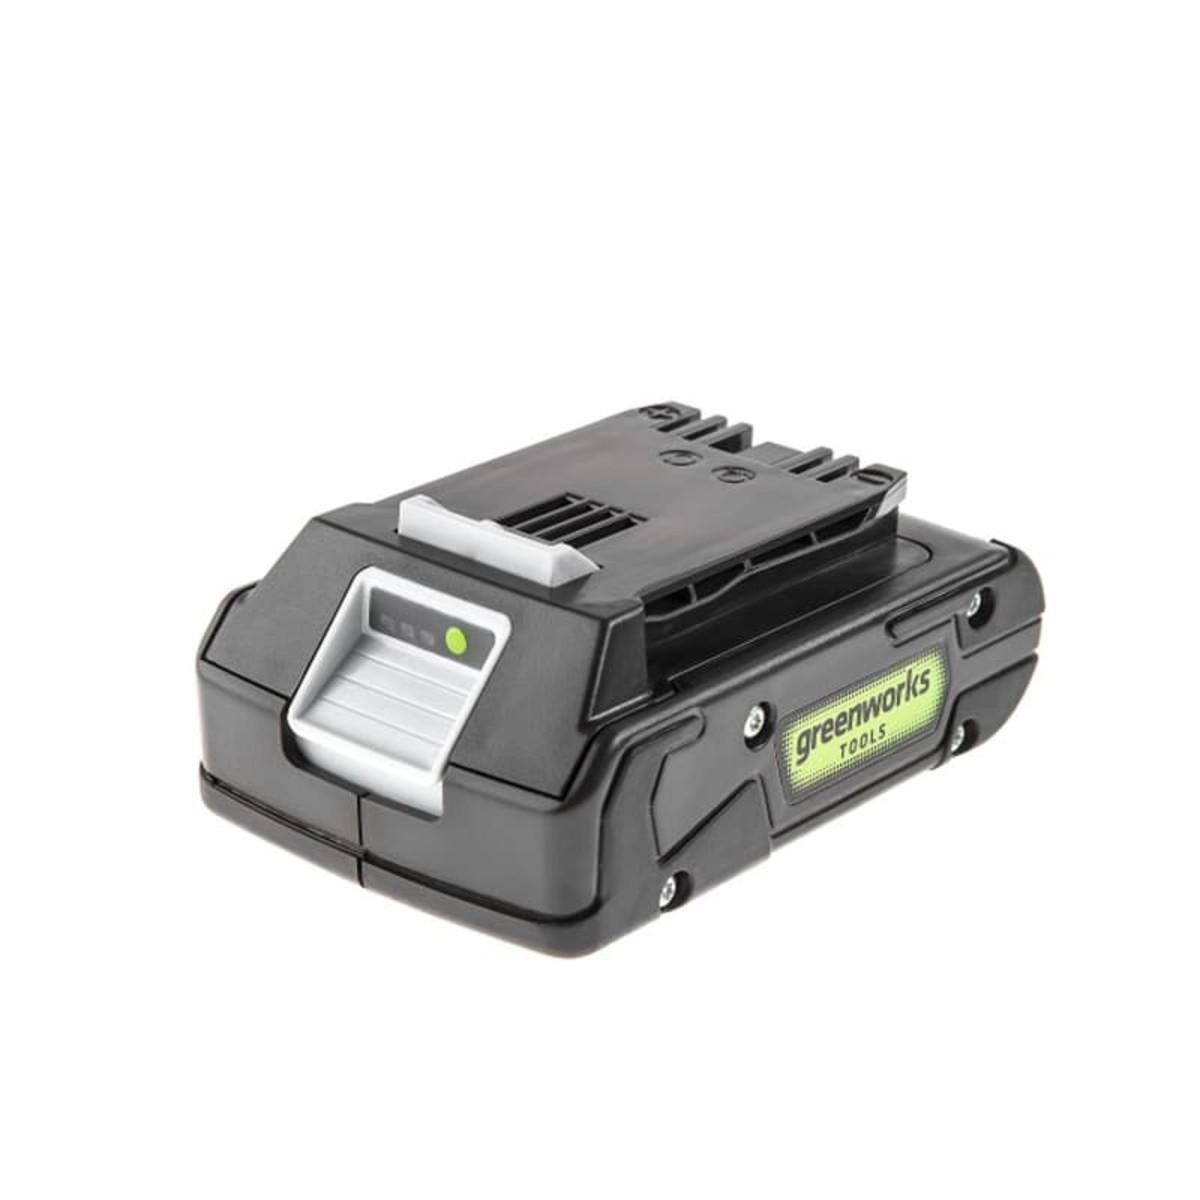 Аккумулятор GreenWorks G24B2 2 Ач 24 В 2902707